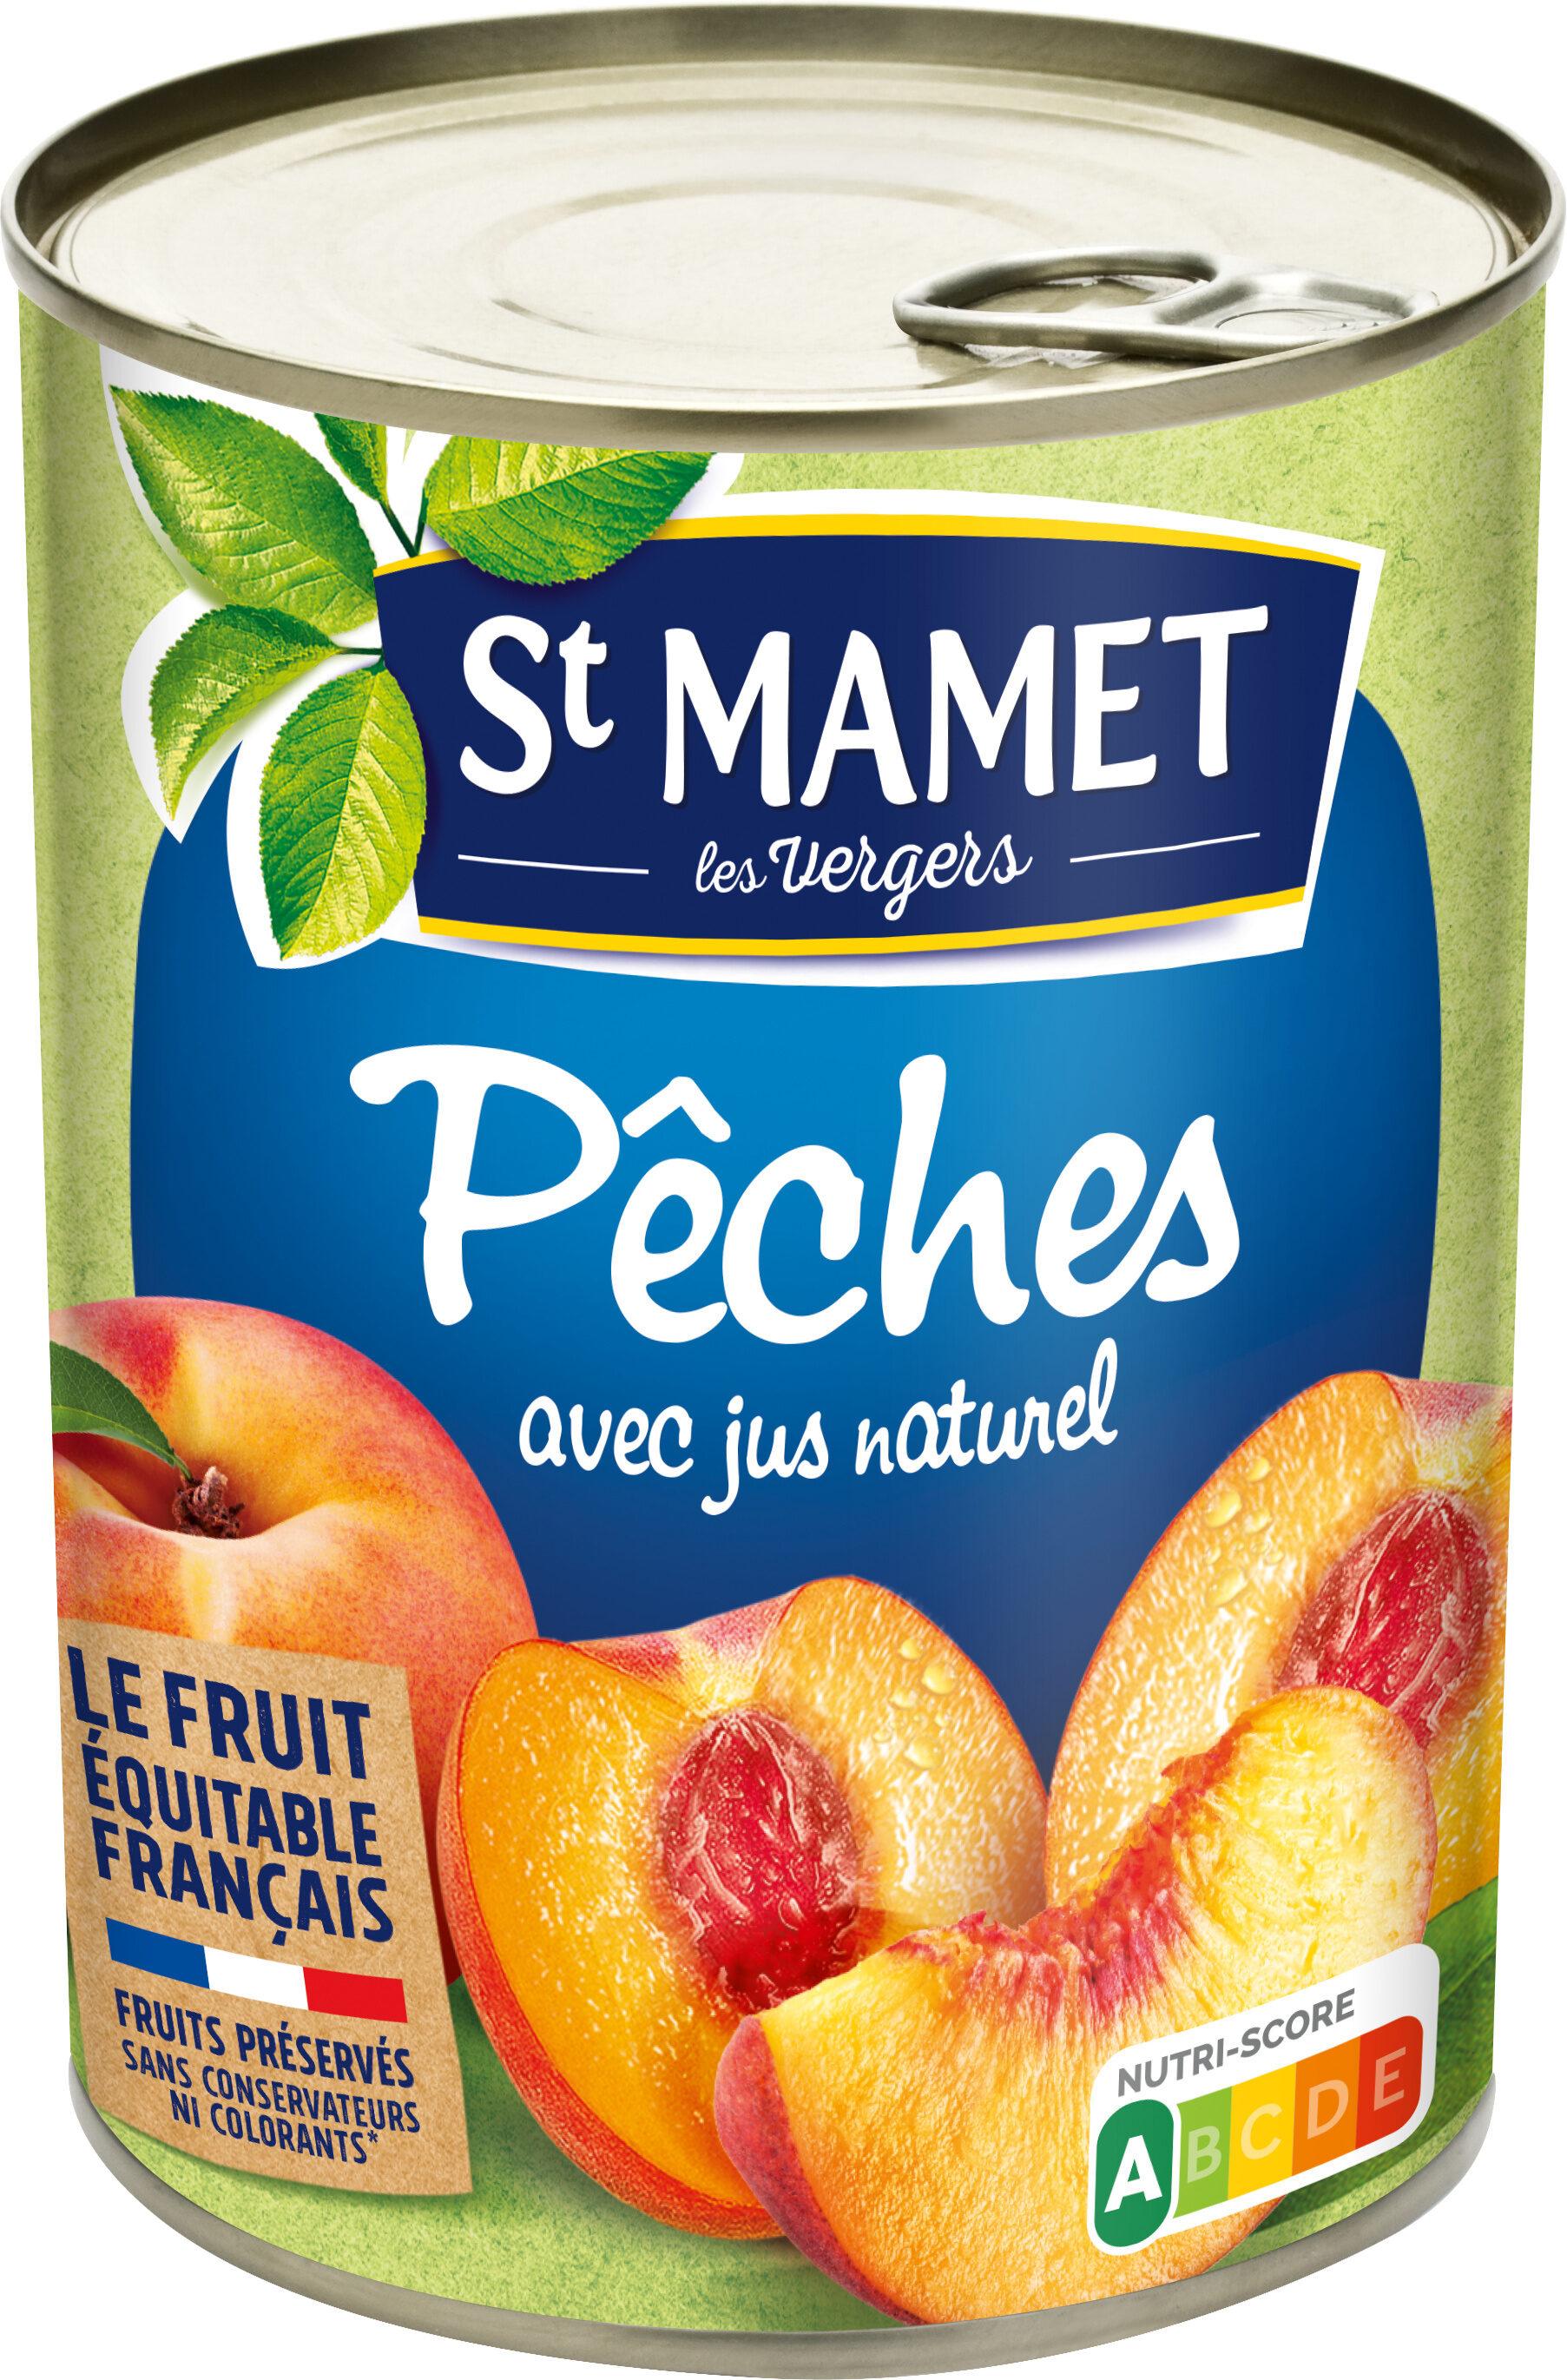 Pêches avec jus naturel - Product - fr